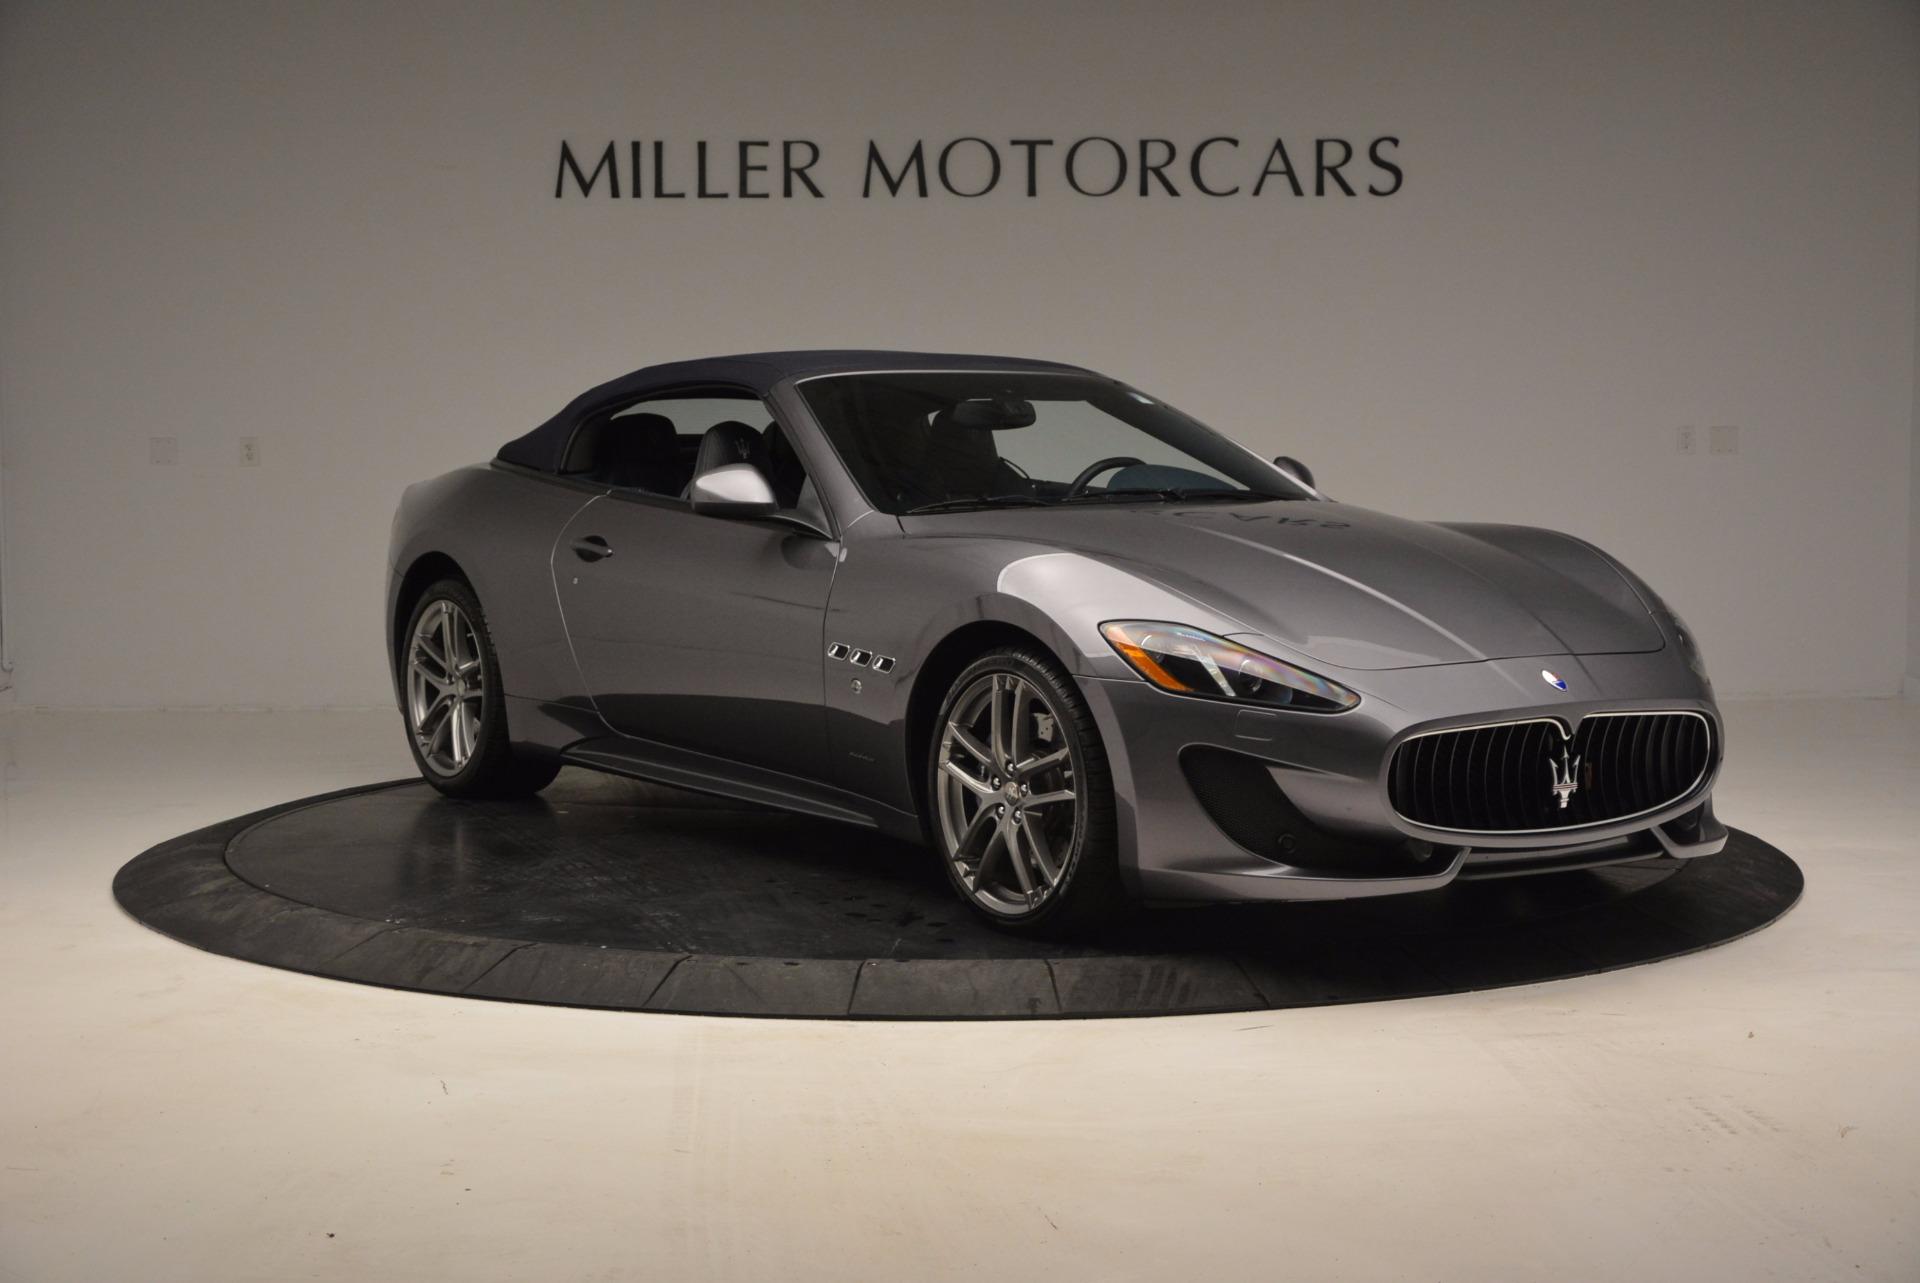 New 2016 Maserati GranTurismo Convertible Sport For Sale In Westport, CT 154_p16